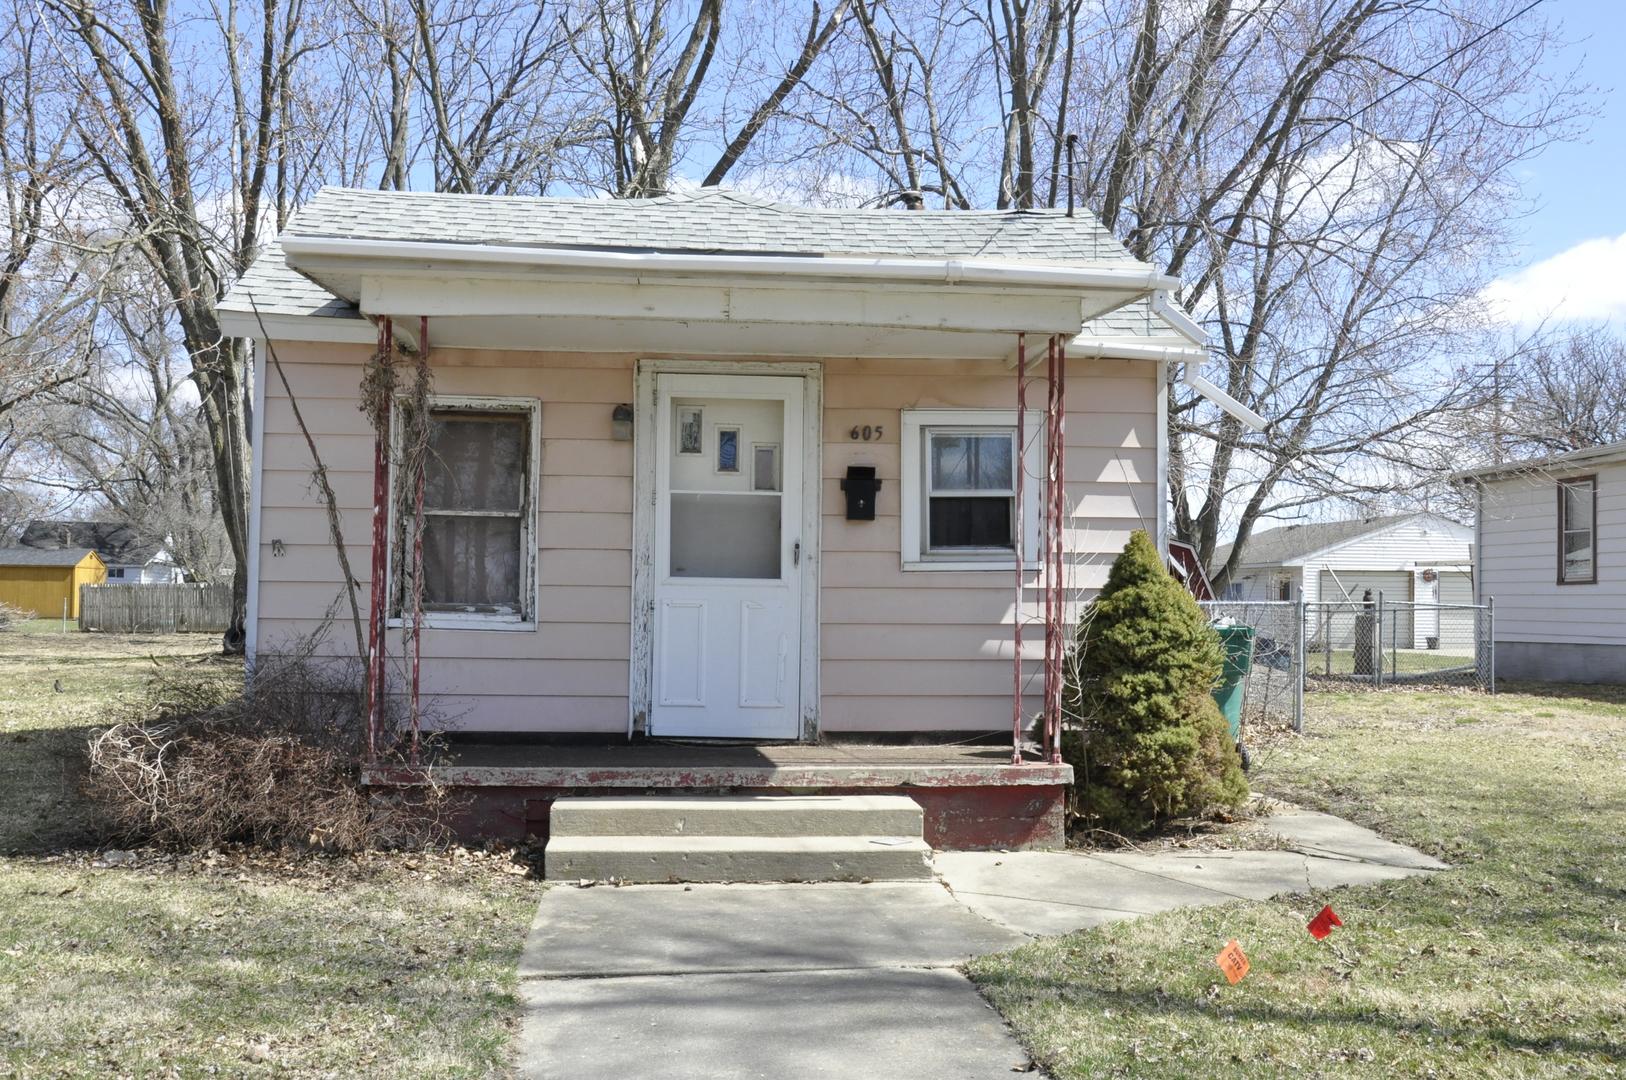 605 Powell, Streator, Illinois, 61364